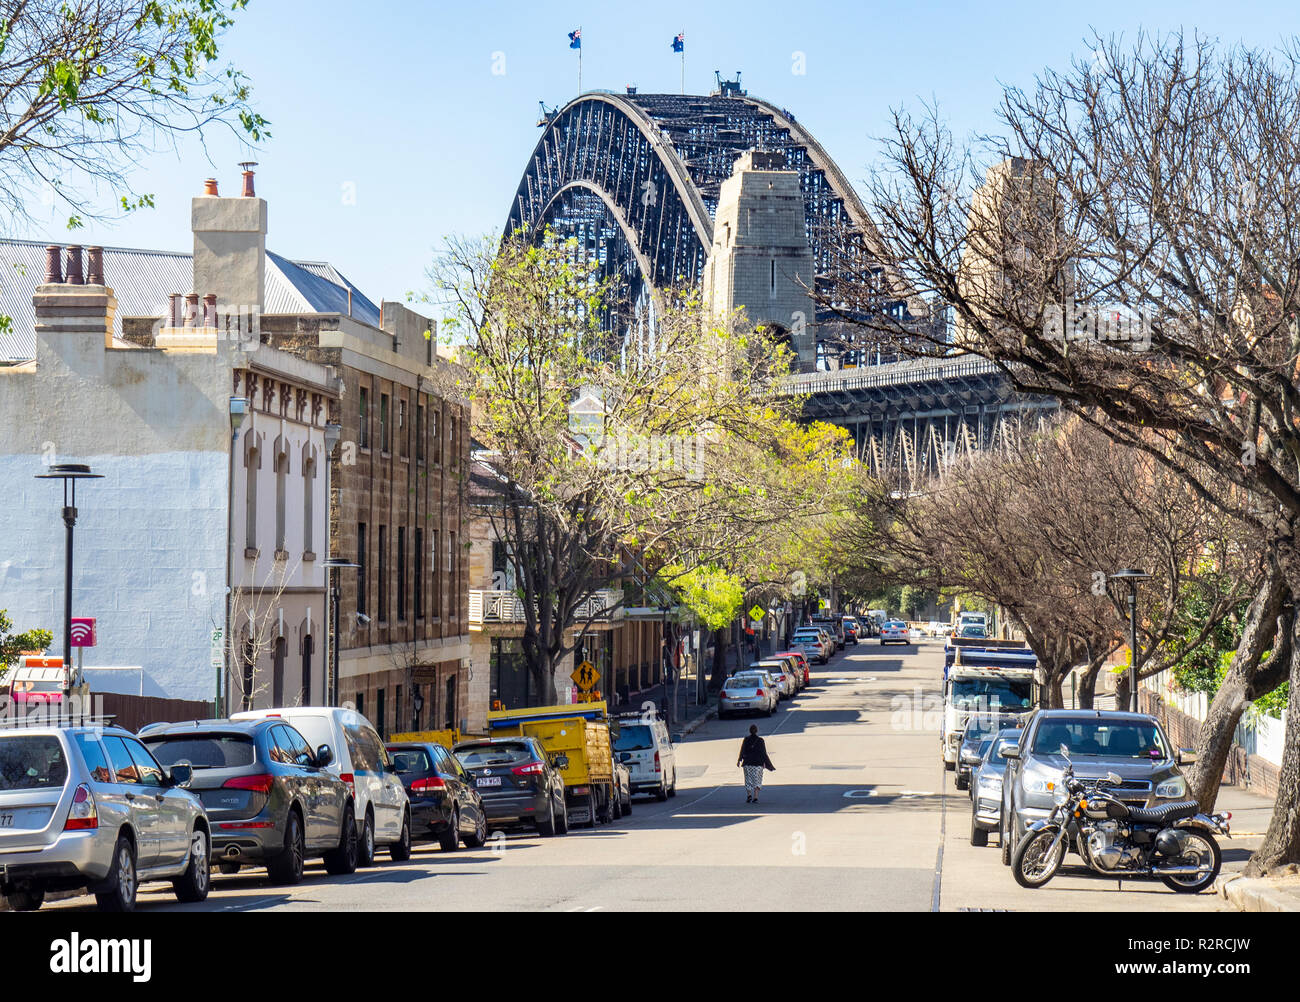 Person walking on Lower Fort Street in Millers Point, Sydney Harboiur Bridge, Sydney NSW Australia. - Stock Image